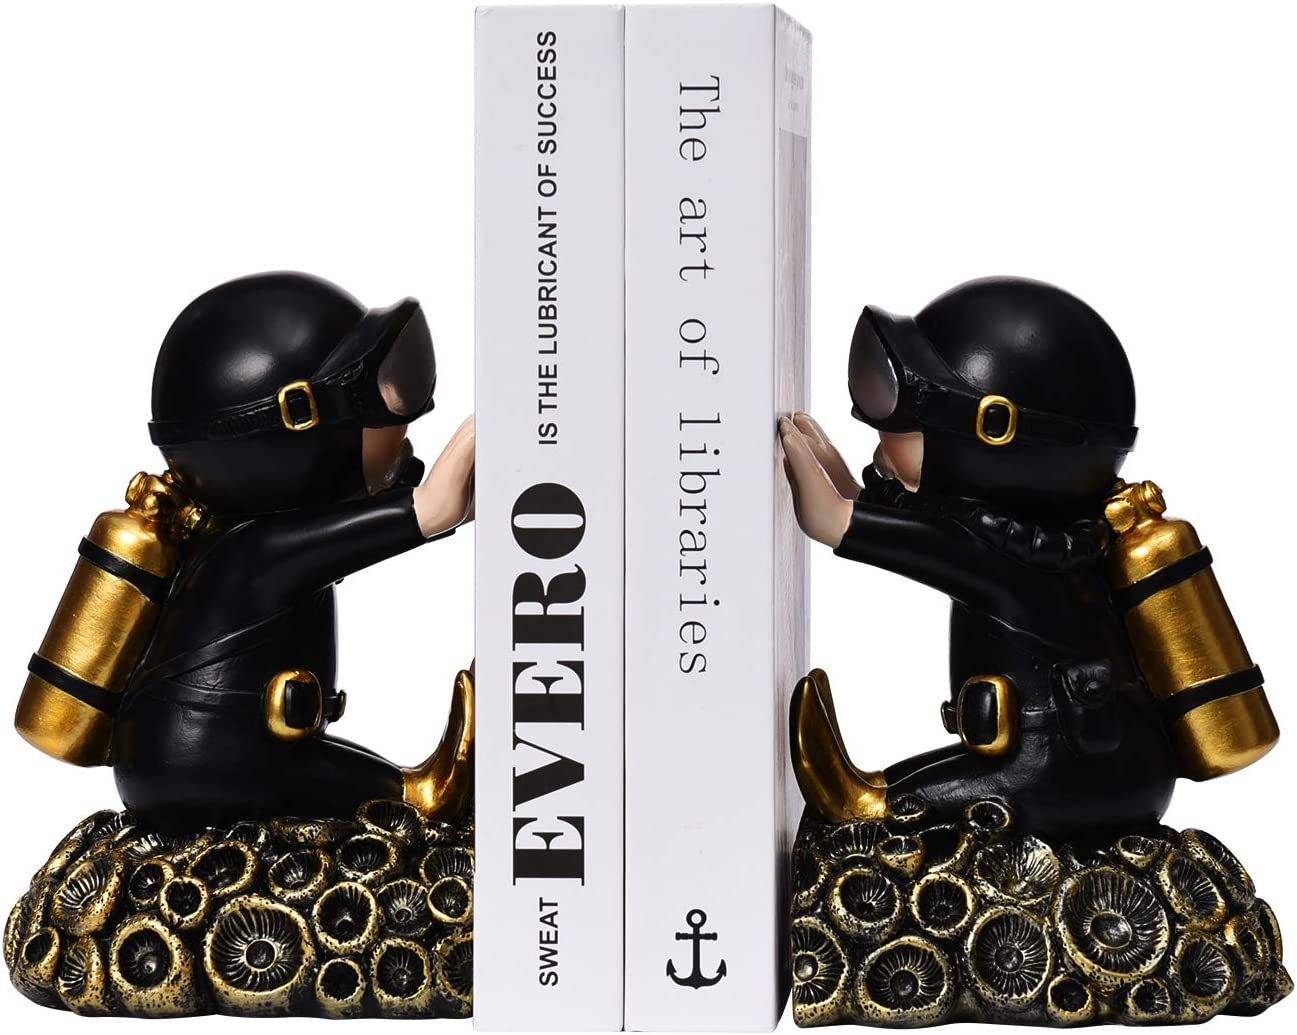 Decorative Diver Theme Bookend Black+Gold, Diver C Resin Decorative Bookshelf Bookends 1 Pair Nonskid Bookends Art Bookend